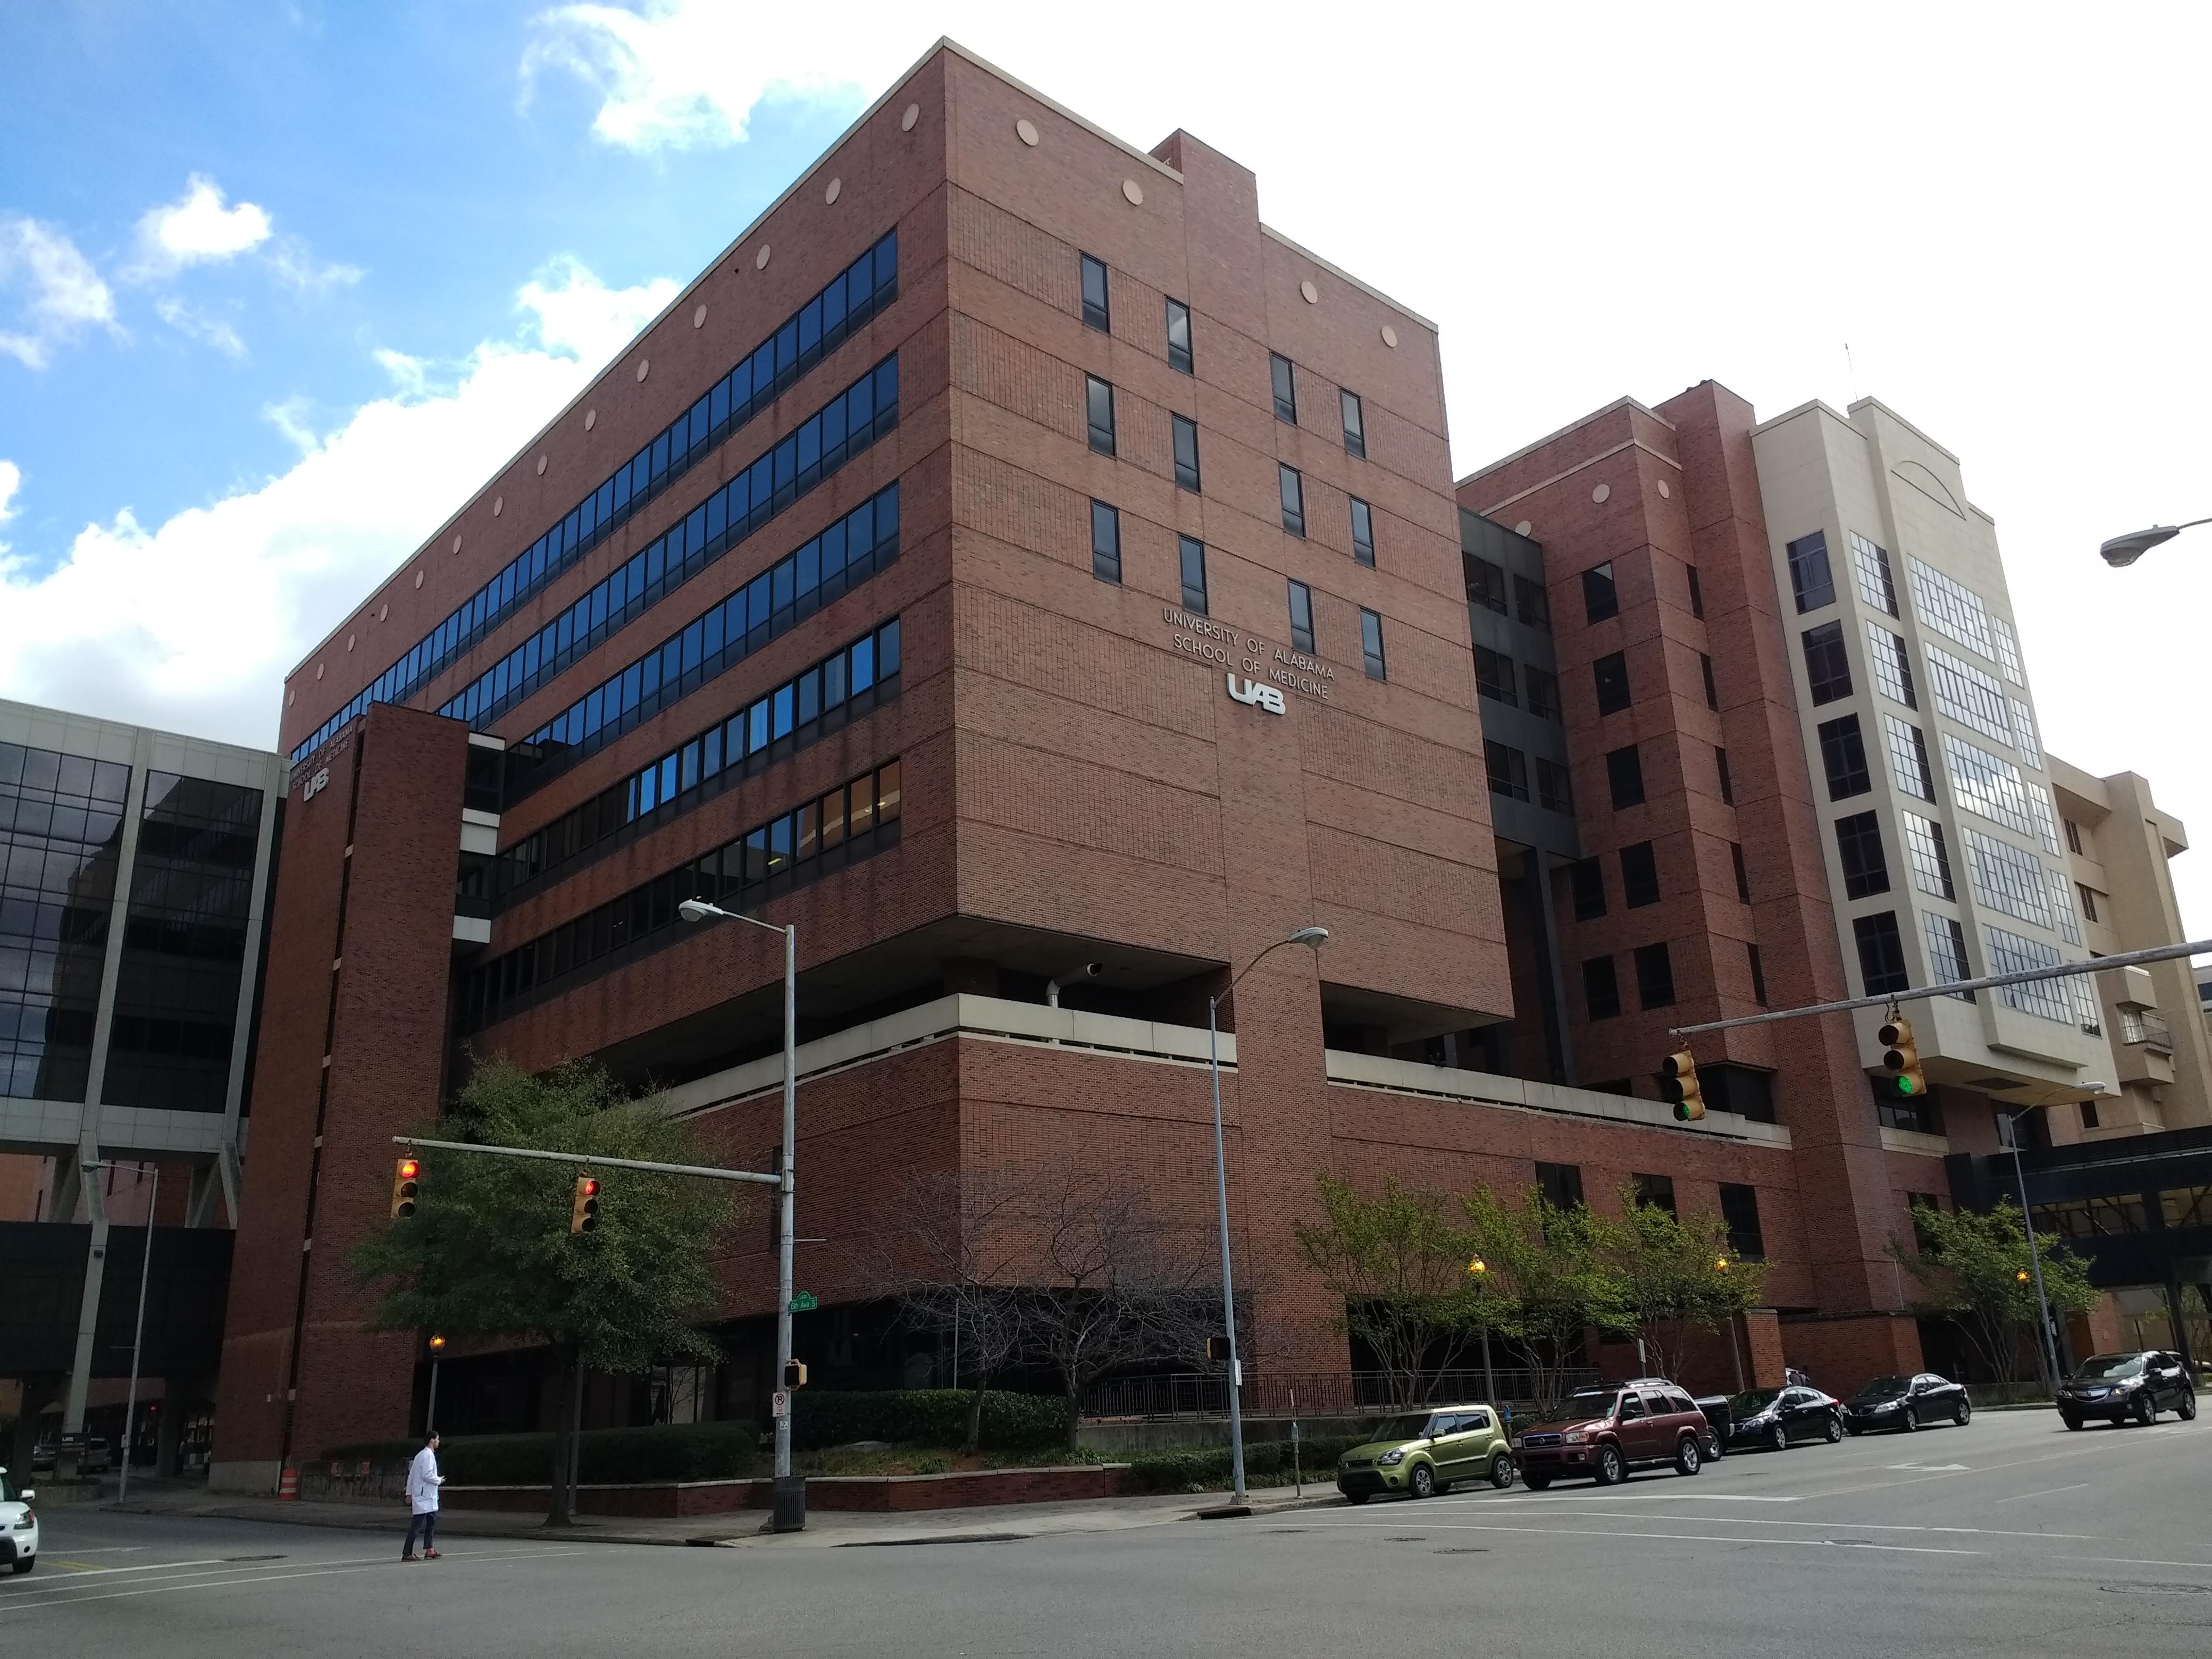 University of Alabama School of Medicine - Wikipedia